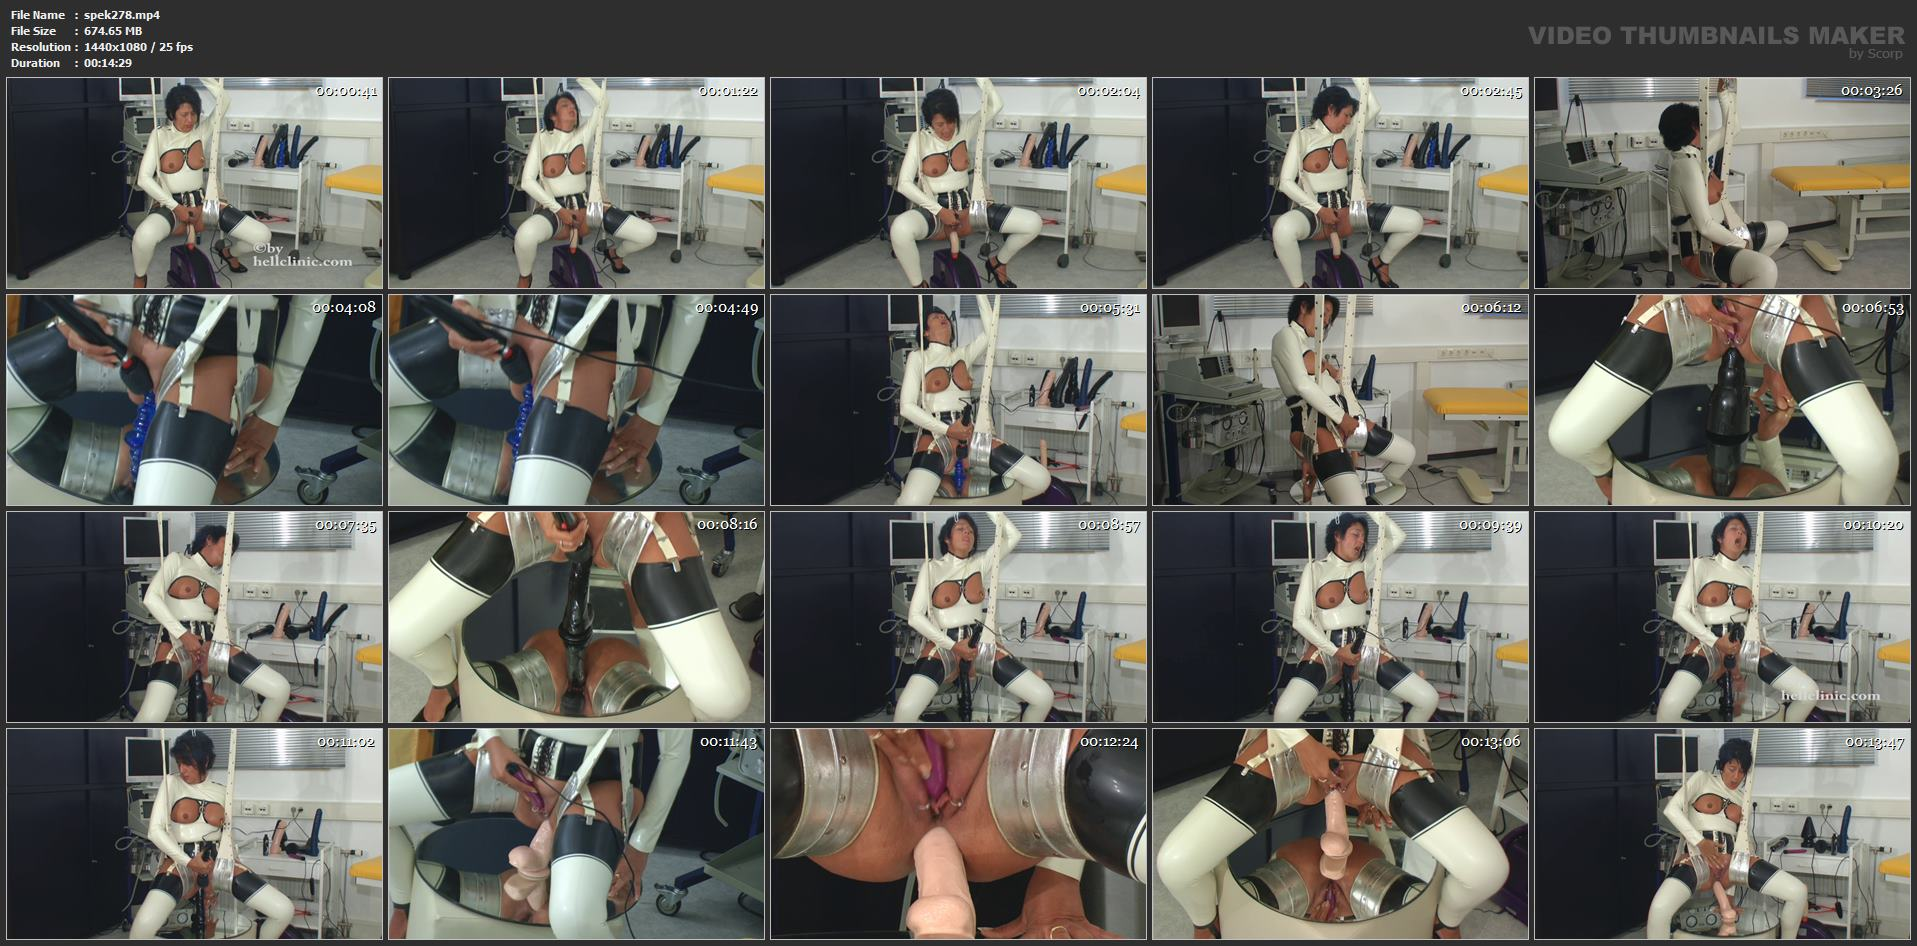 [SPEKULA] Bizarre anal stretching [FULL HD][1080p][MP4]